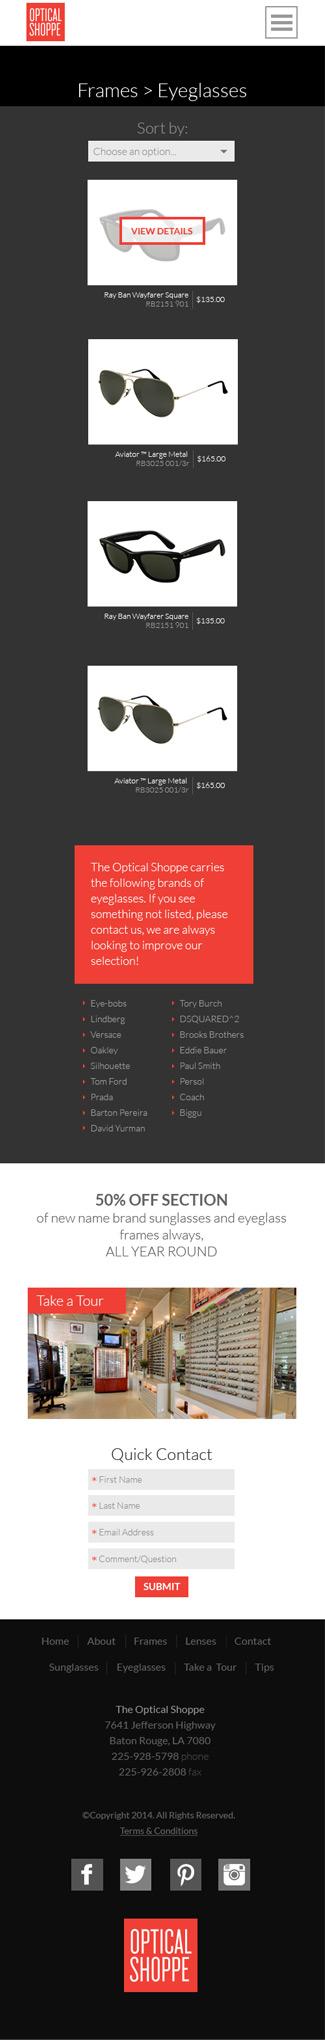 Gatorworks - Optical Shoppe